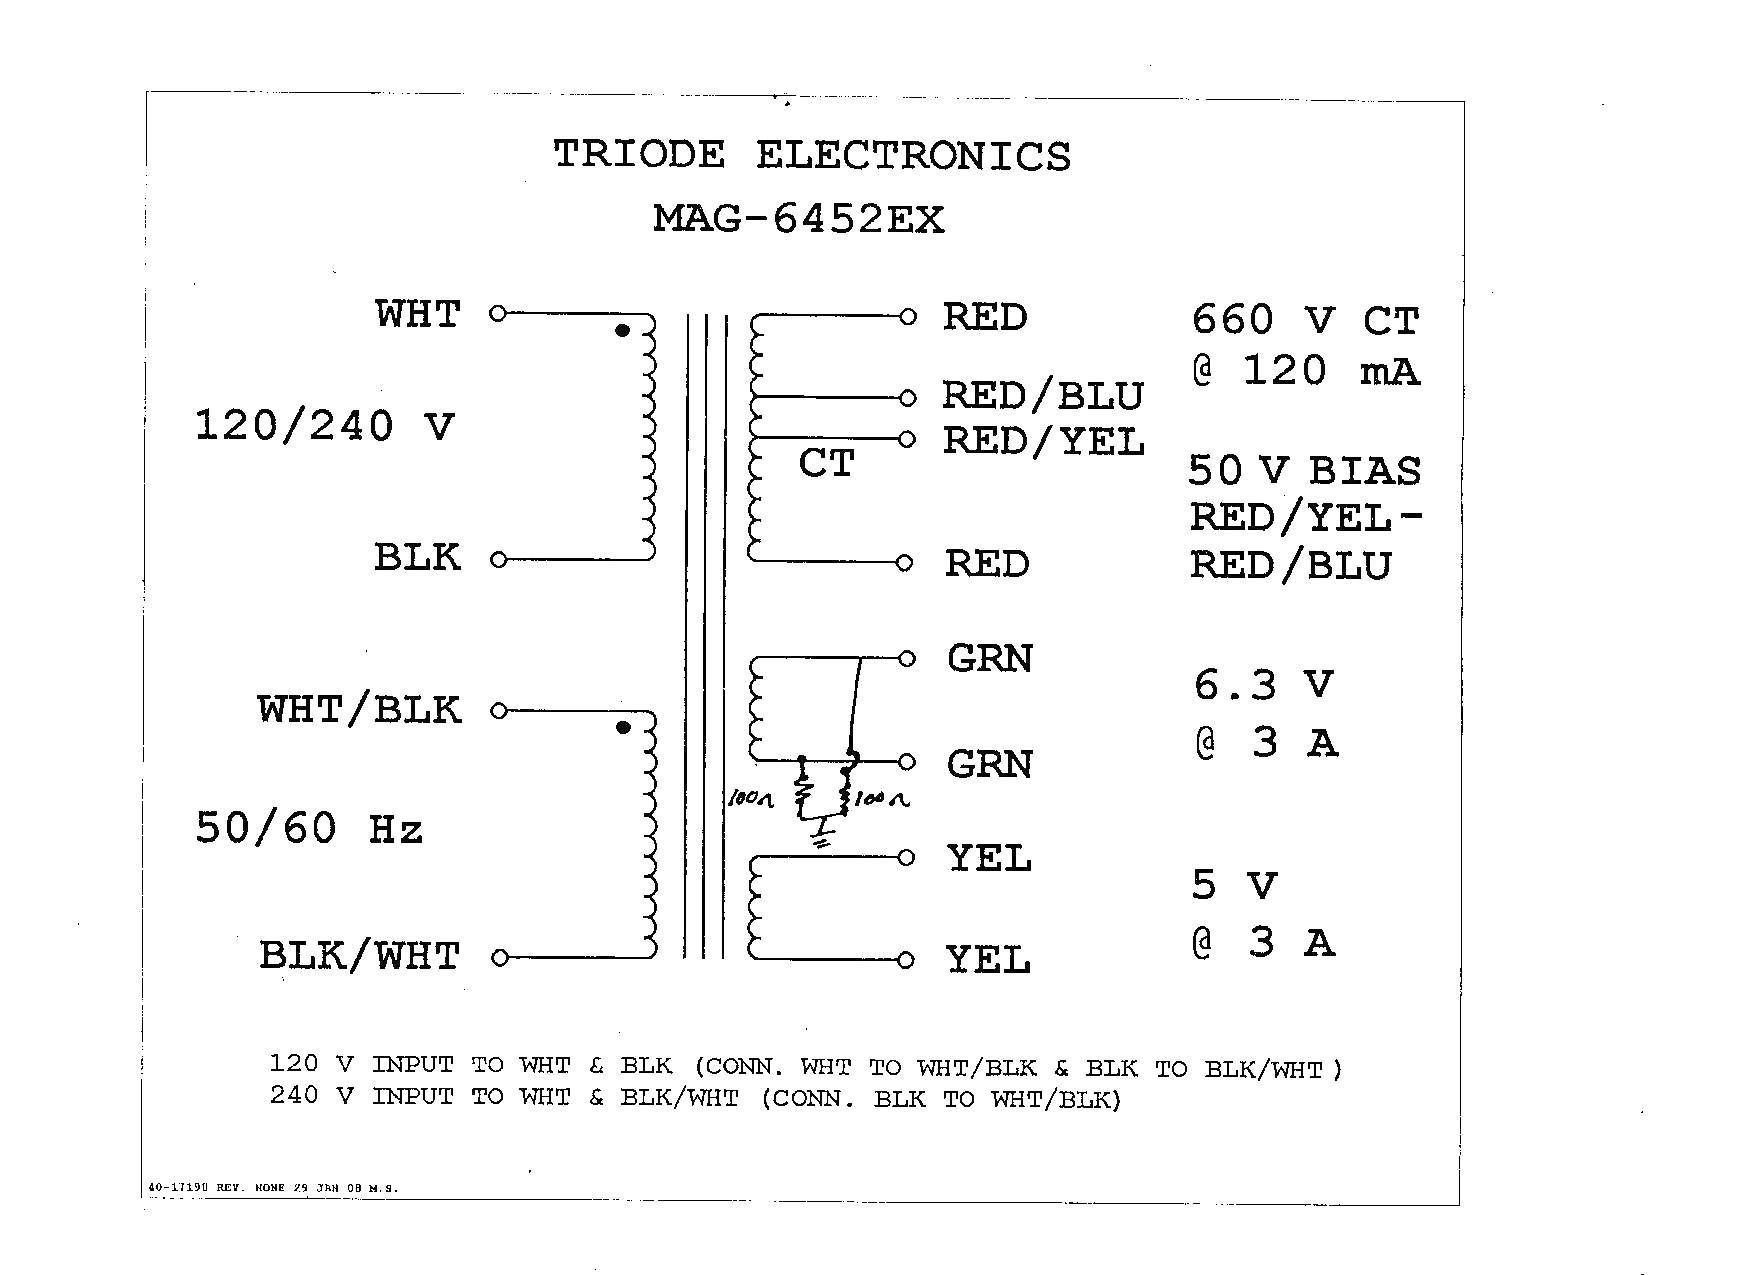 square d buck boost transformer wiring diagram Collection-Wiring Diagram Detail Name square d buck boost transformer wiring diagram – Square D Transformer 8-q